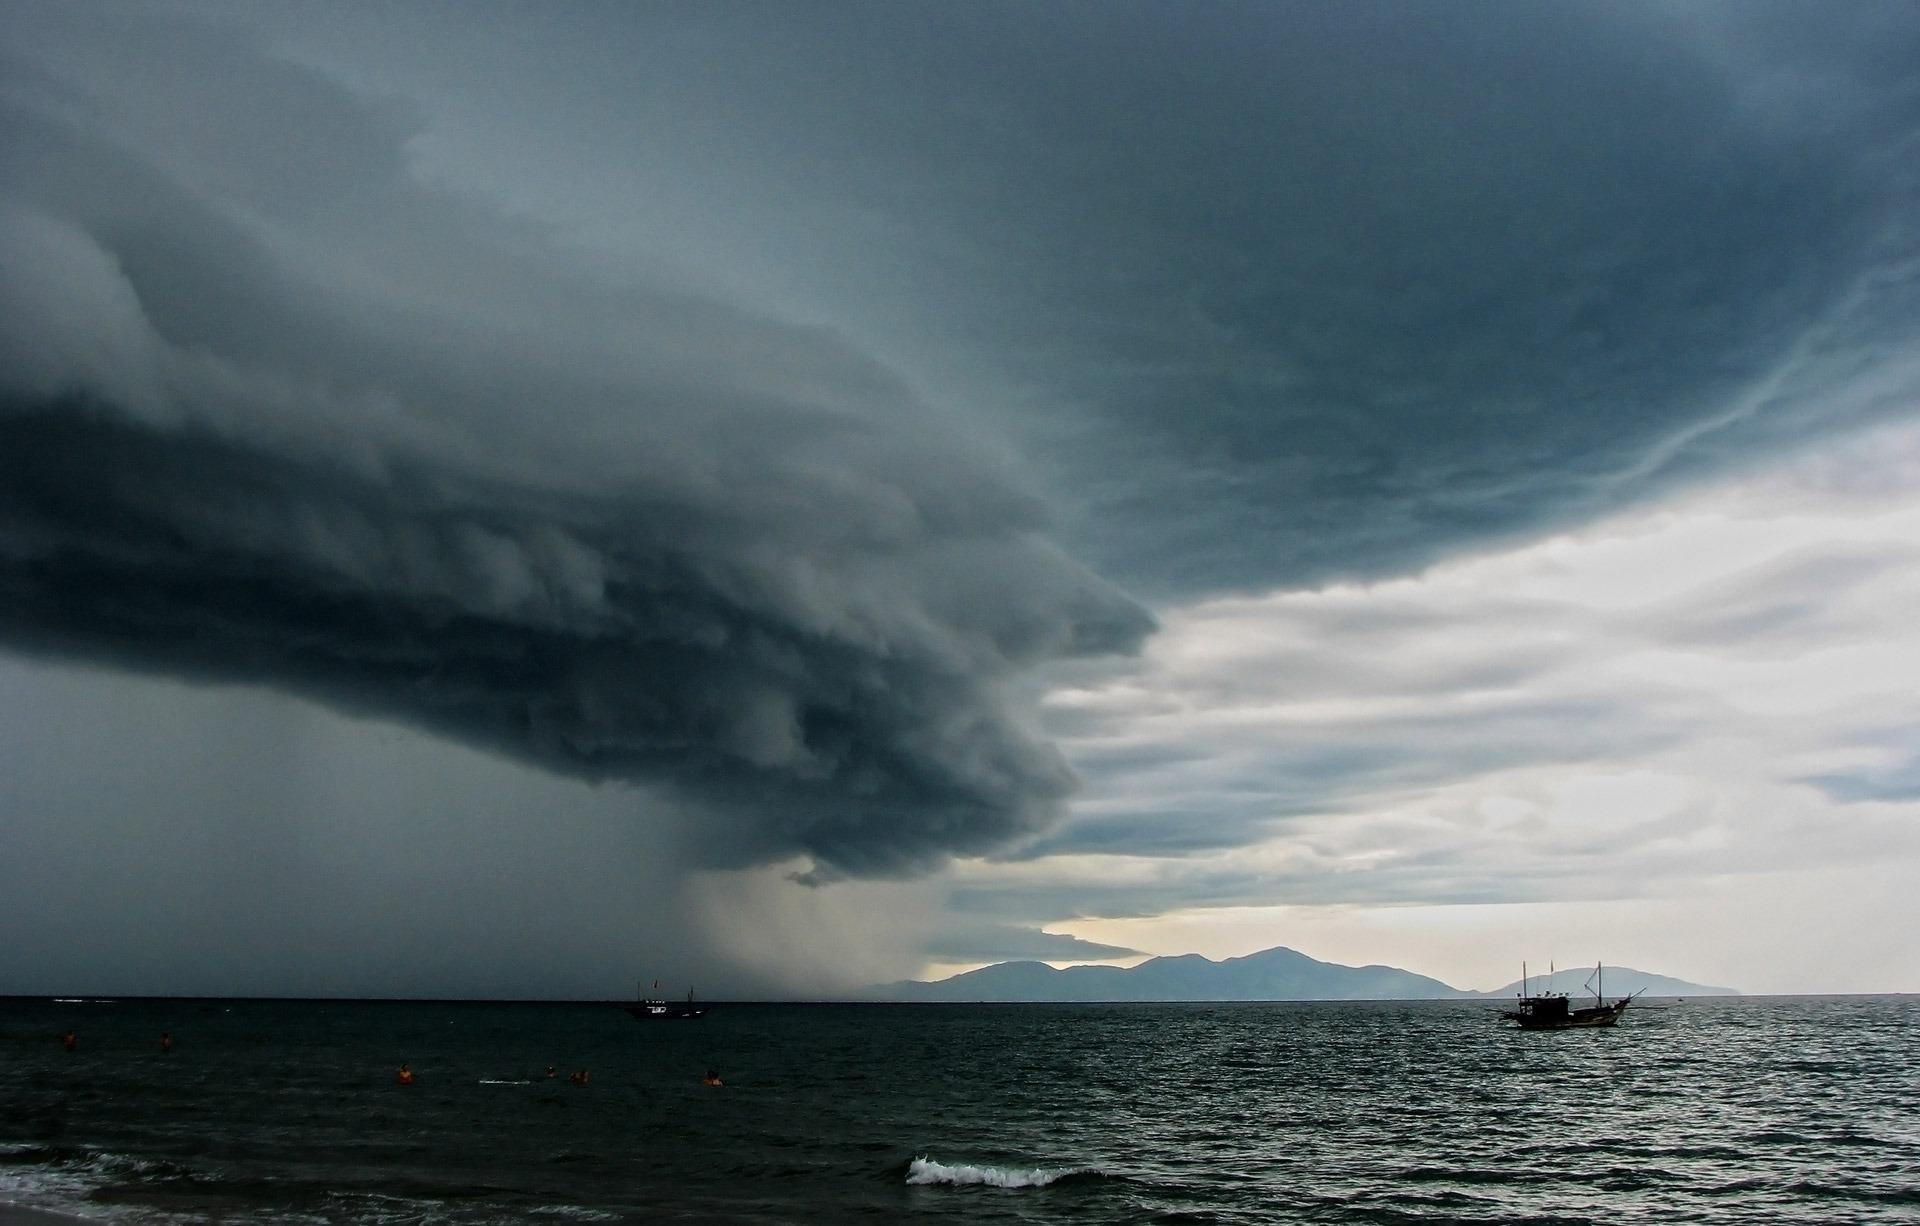 Free Images : Sea, Ocean, Horizon, Cloud, Rain, Weather